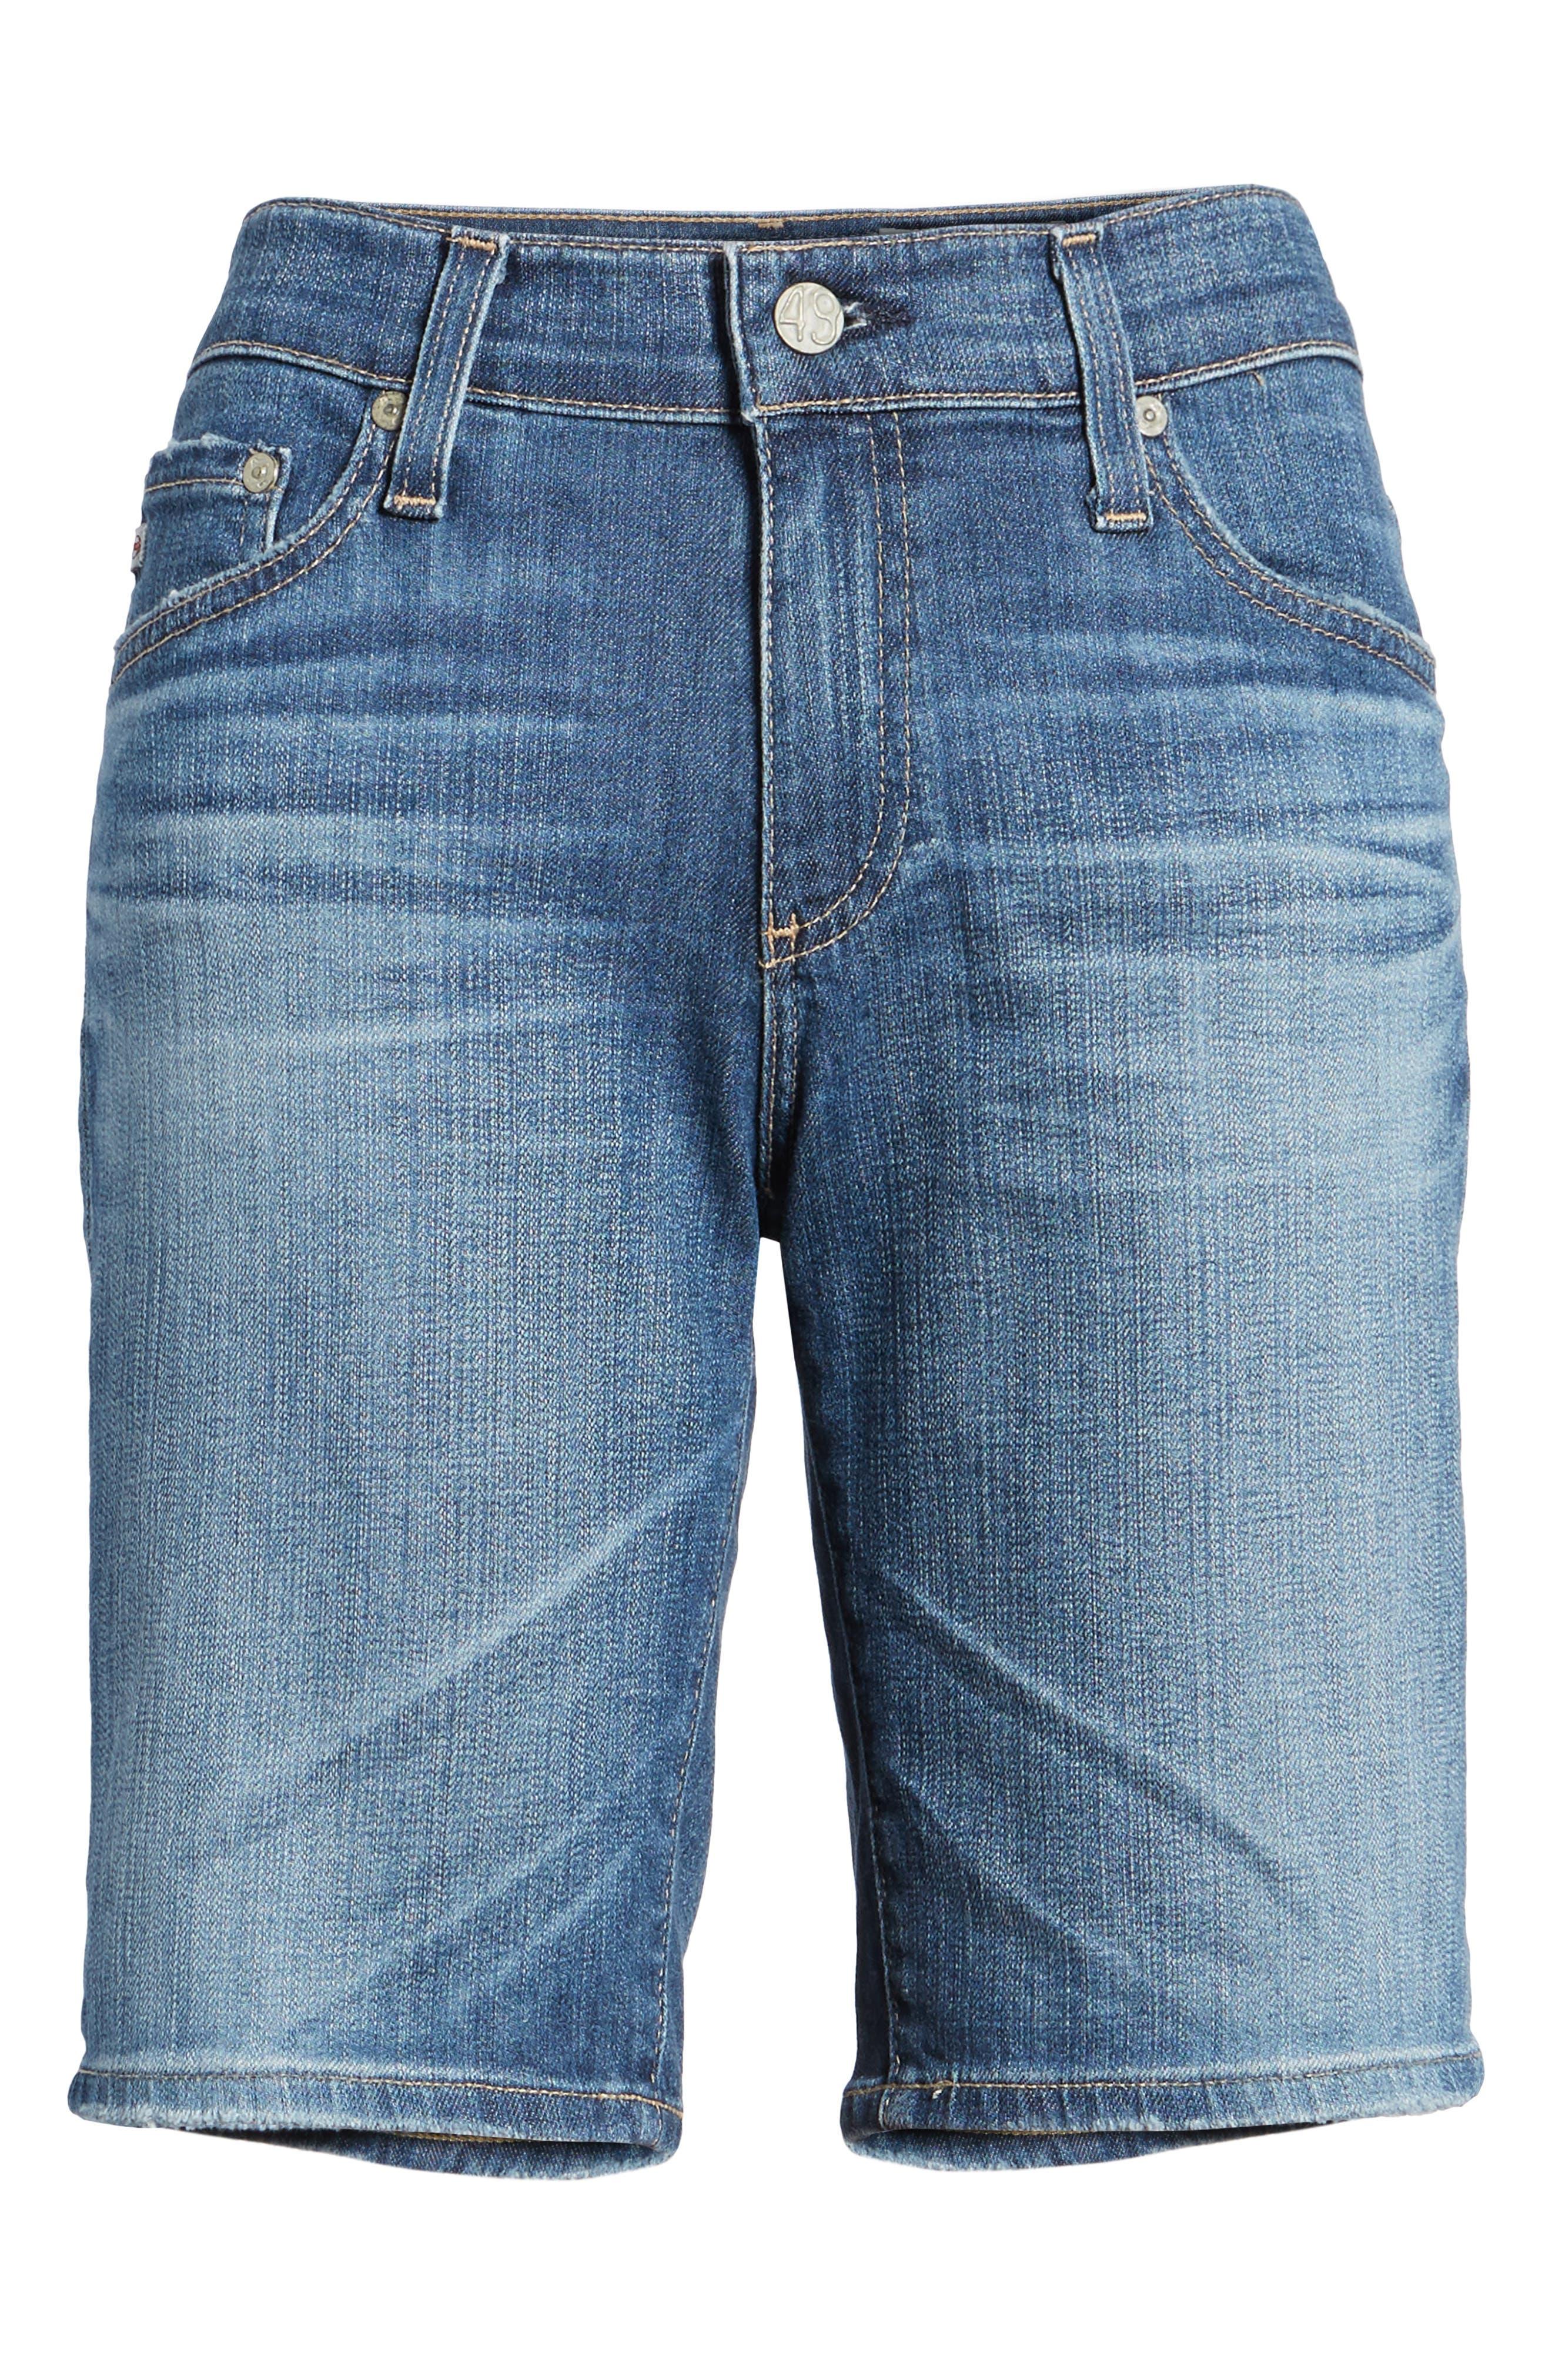 'Nikki' Distressed Denim Bermuda Shorts,                             Alternate thumbnail 6, color,                             11 Years Sapphire Sky